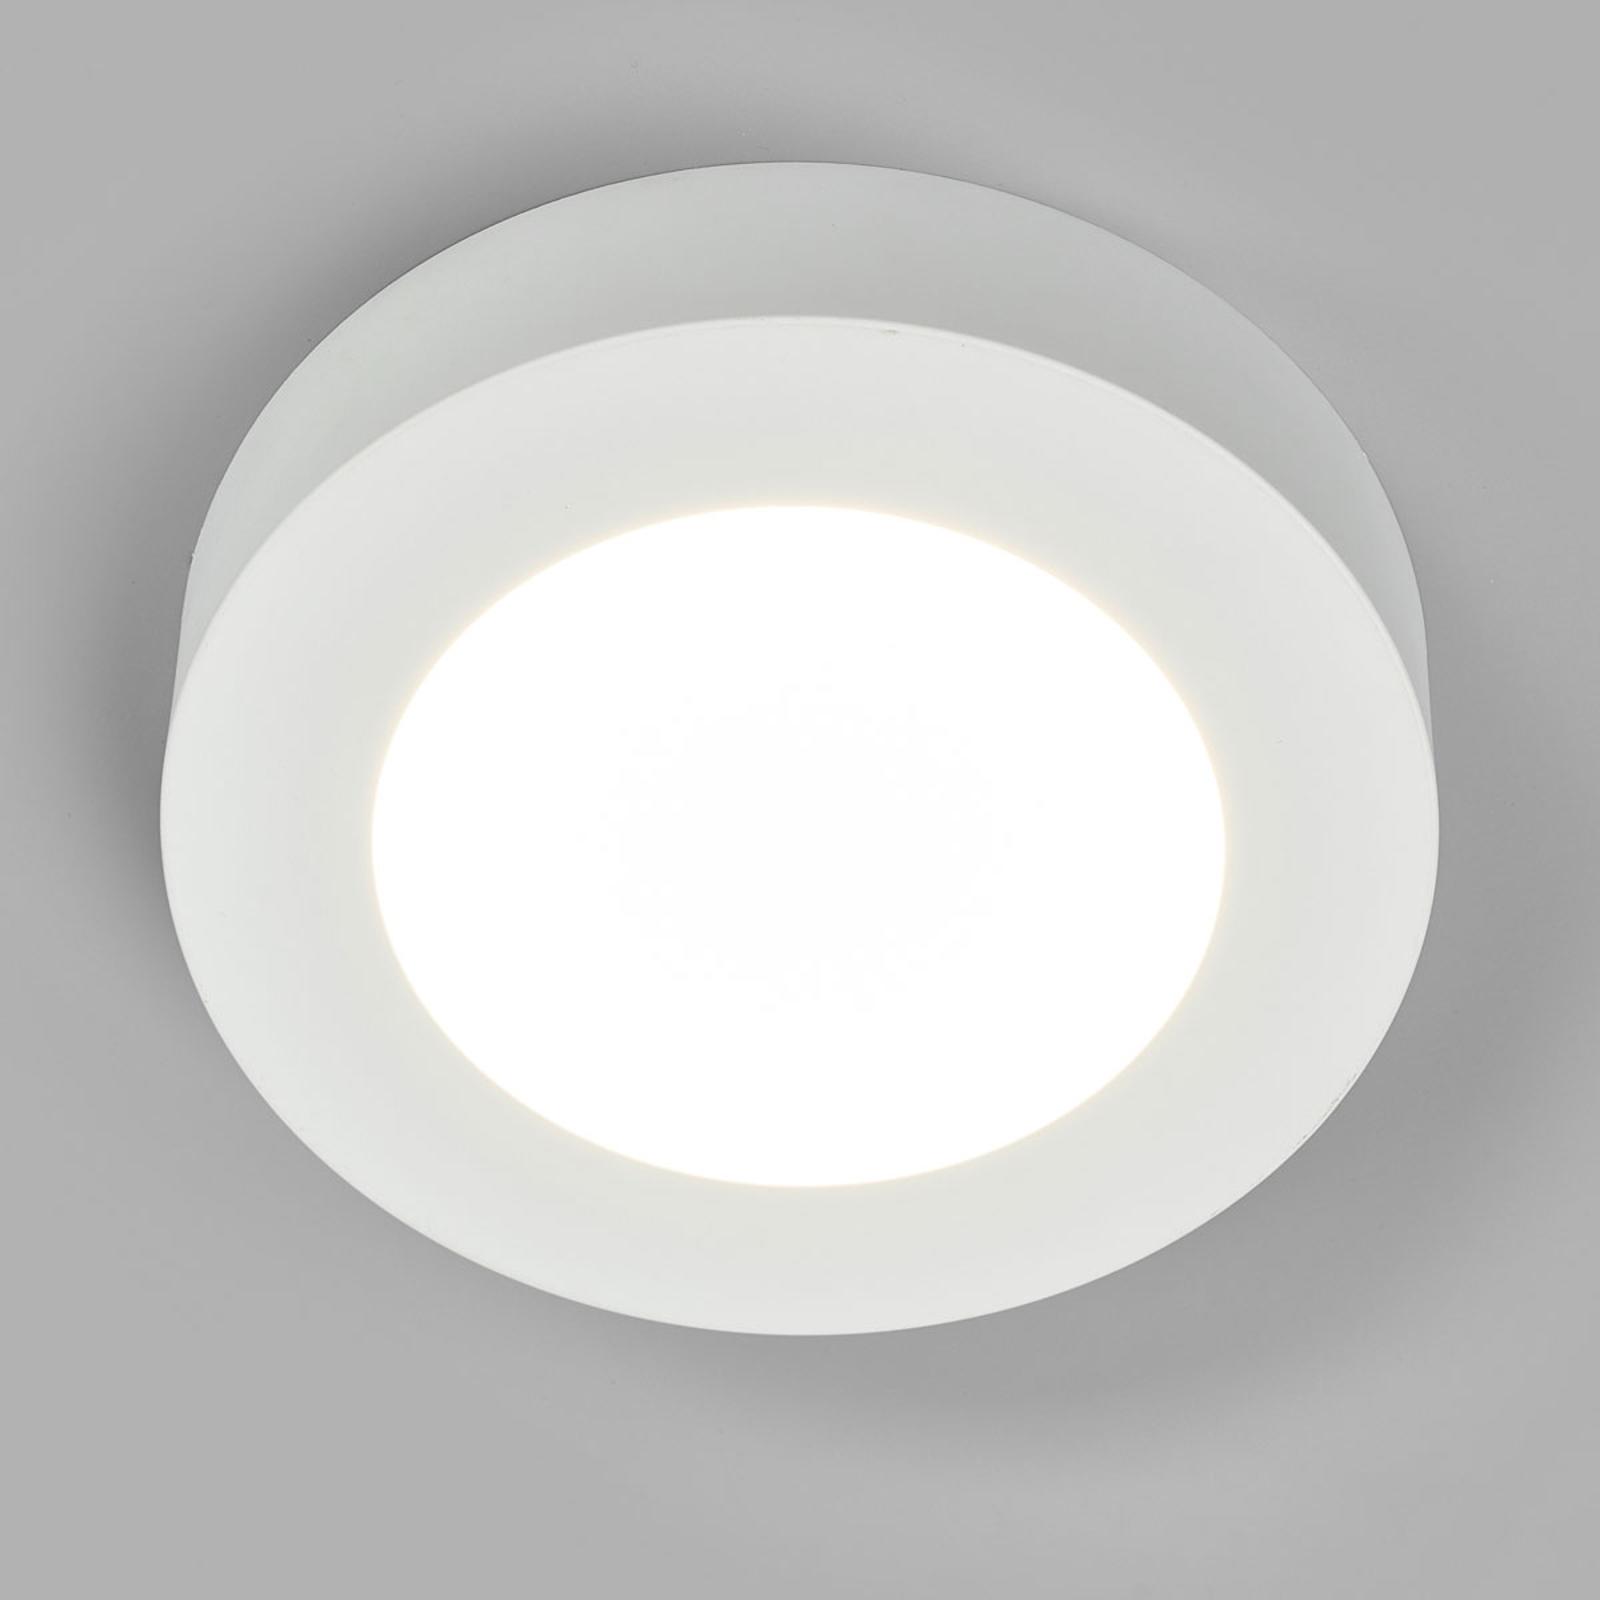 Plafoniera Marlo bianco 4000K rotonda 18,2cm